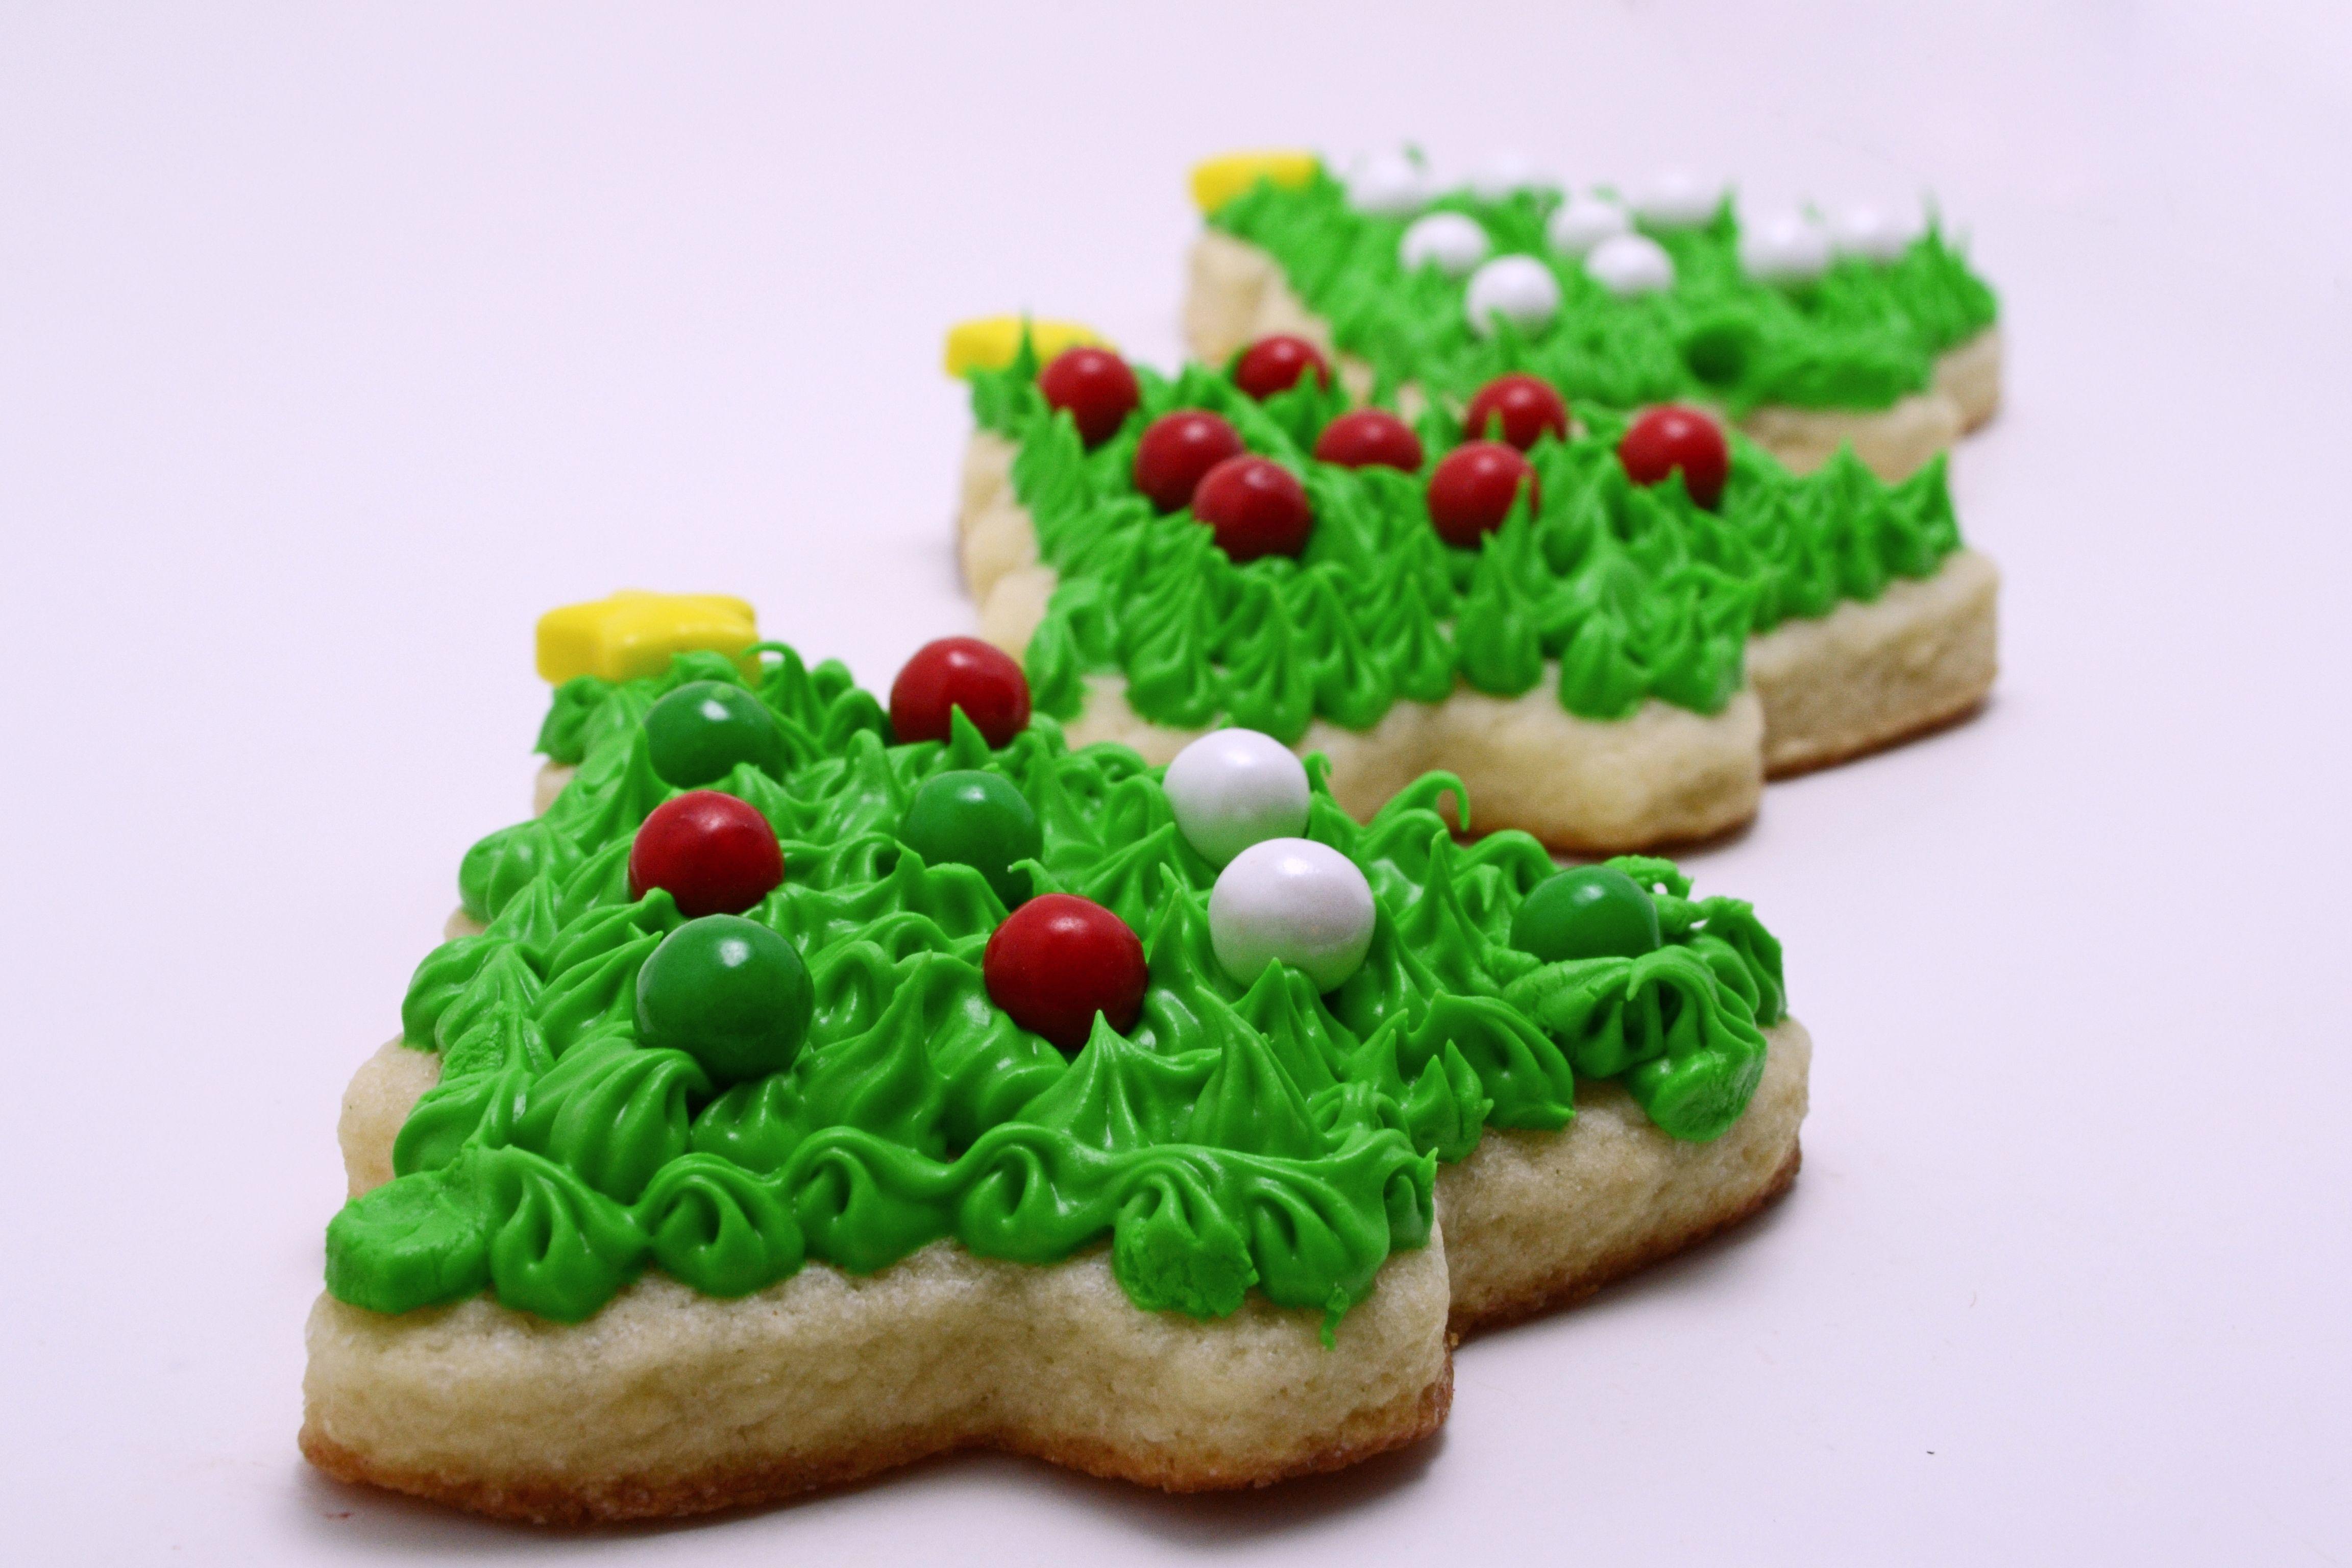 Celebration by SweetWorks Christmas Sixlets on tree cookies by http://savvysavingcouple.net/